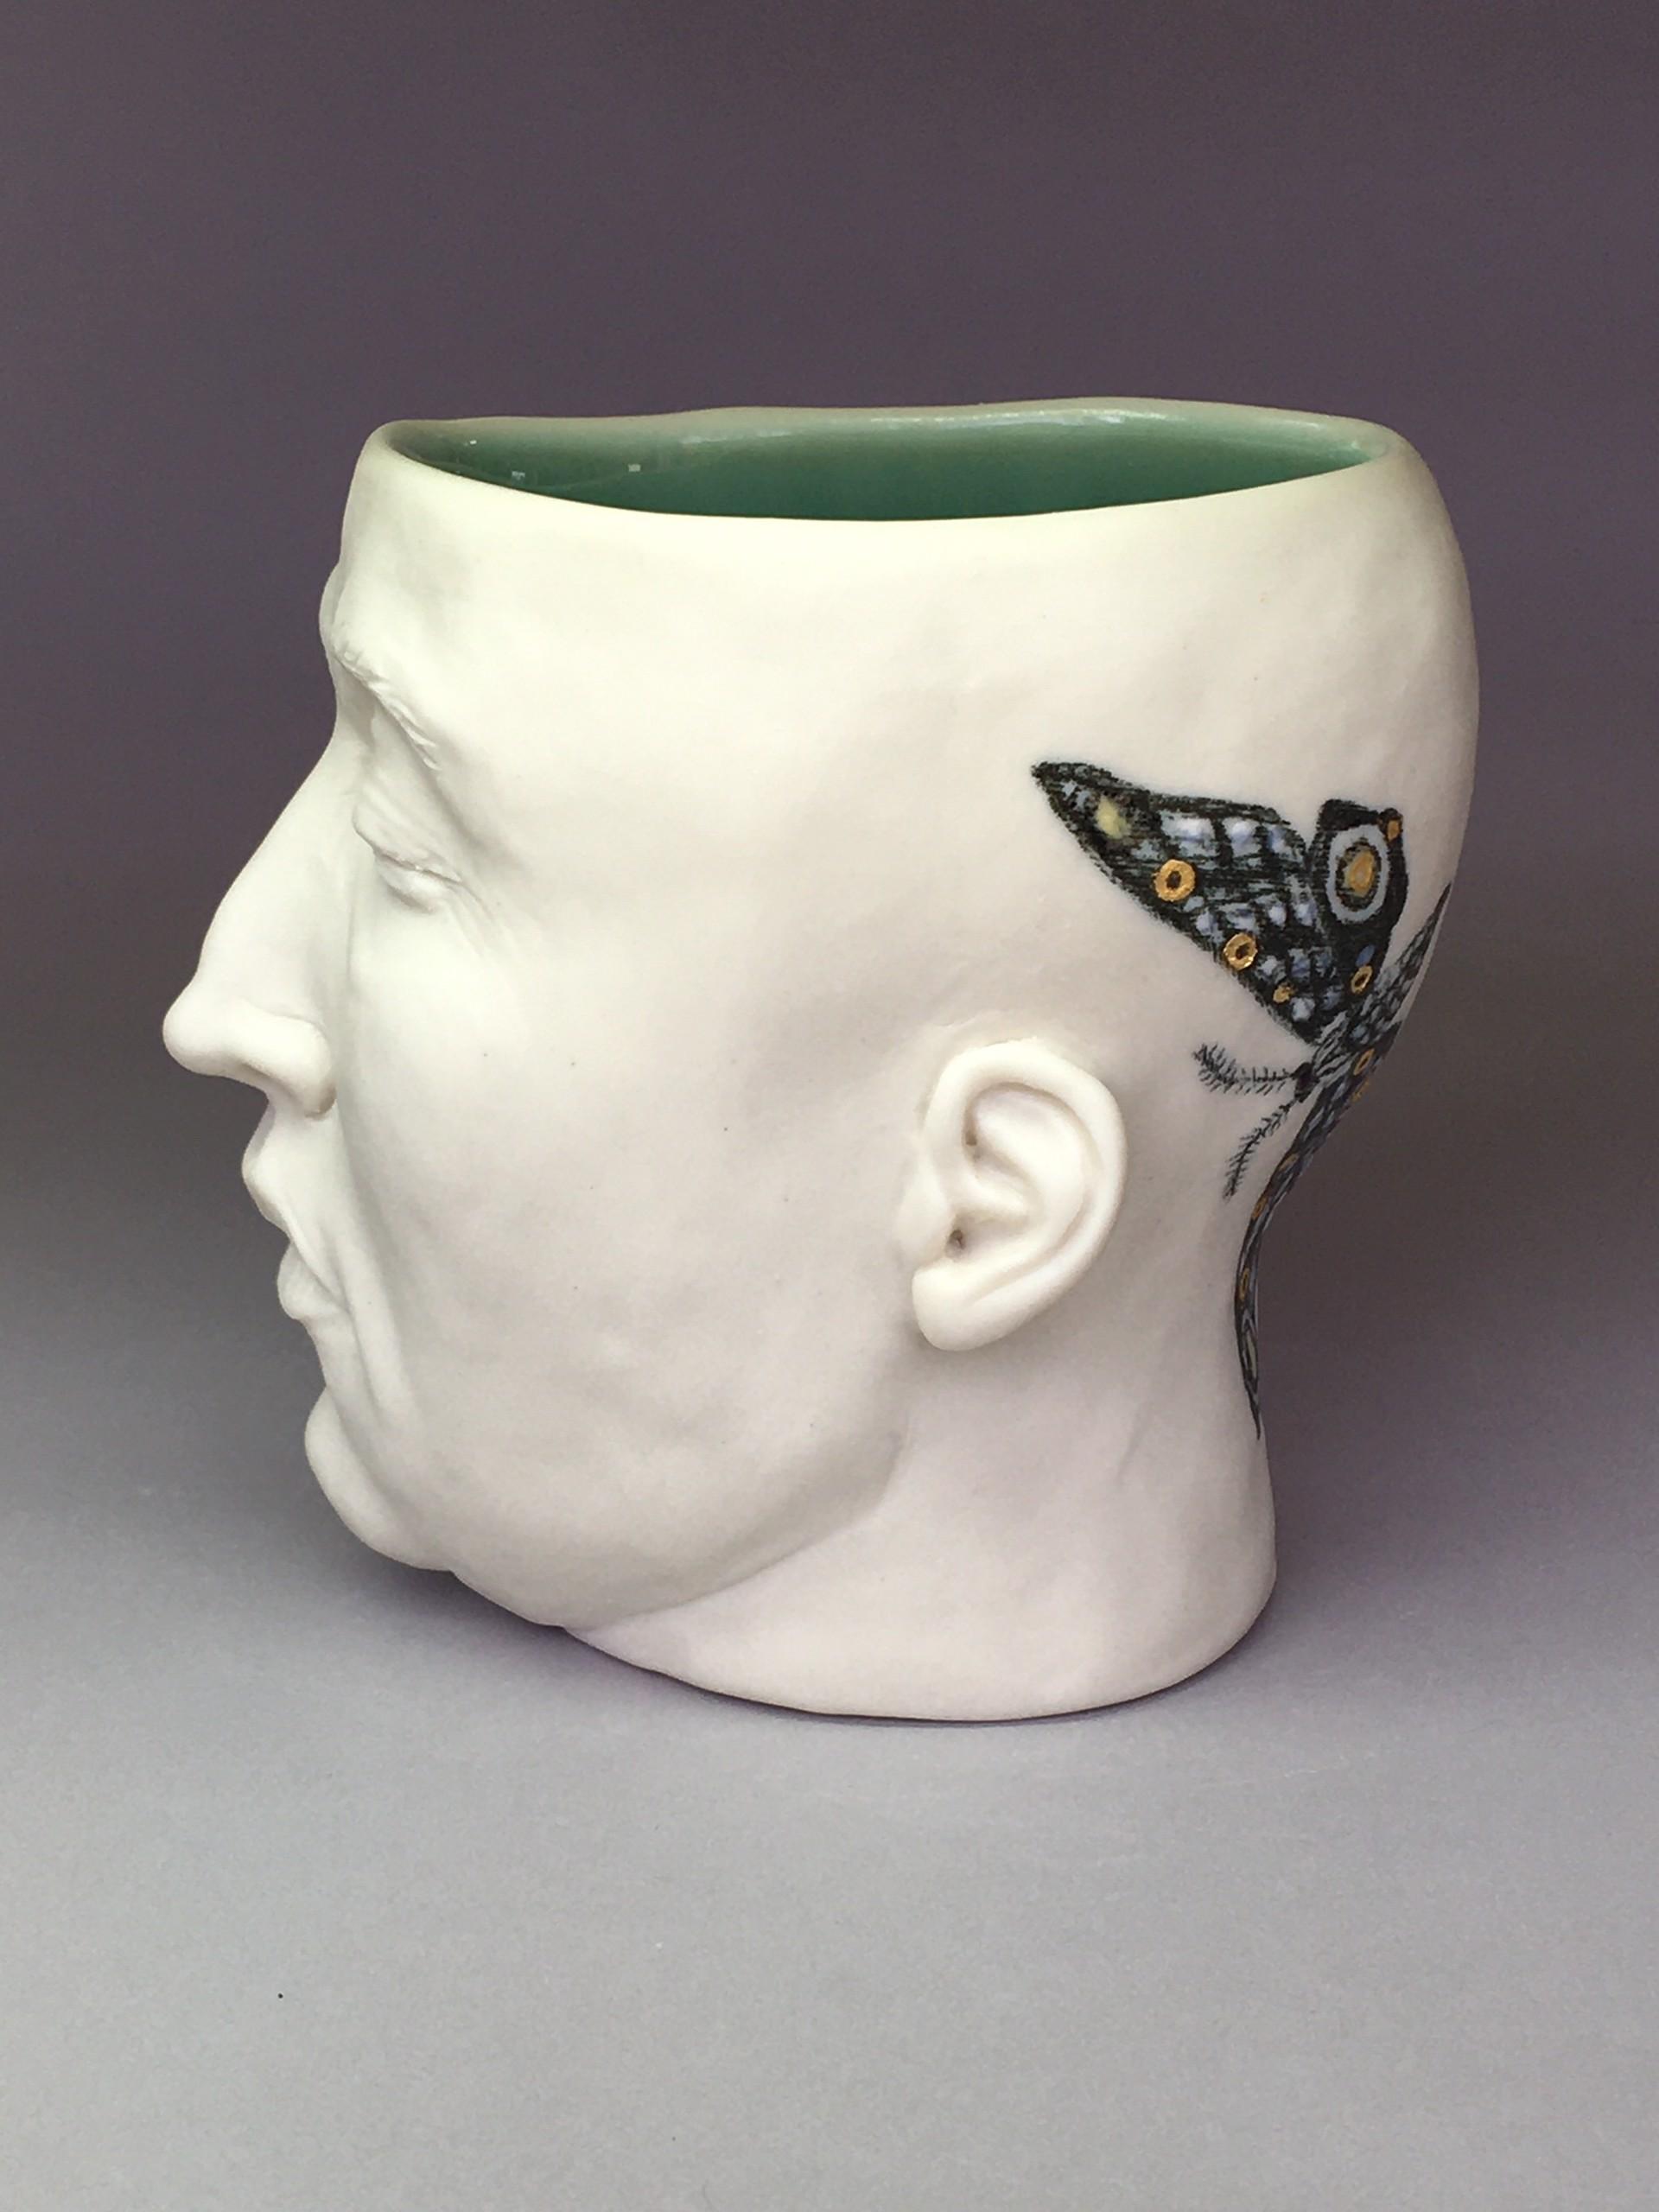 "Moth Cup III"" (left side, deep green celadon, eyes closed) by Adrian Arleo"